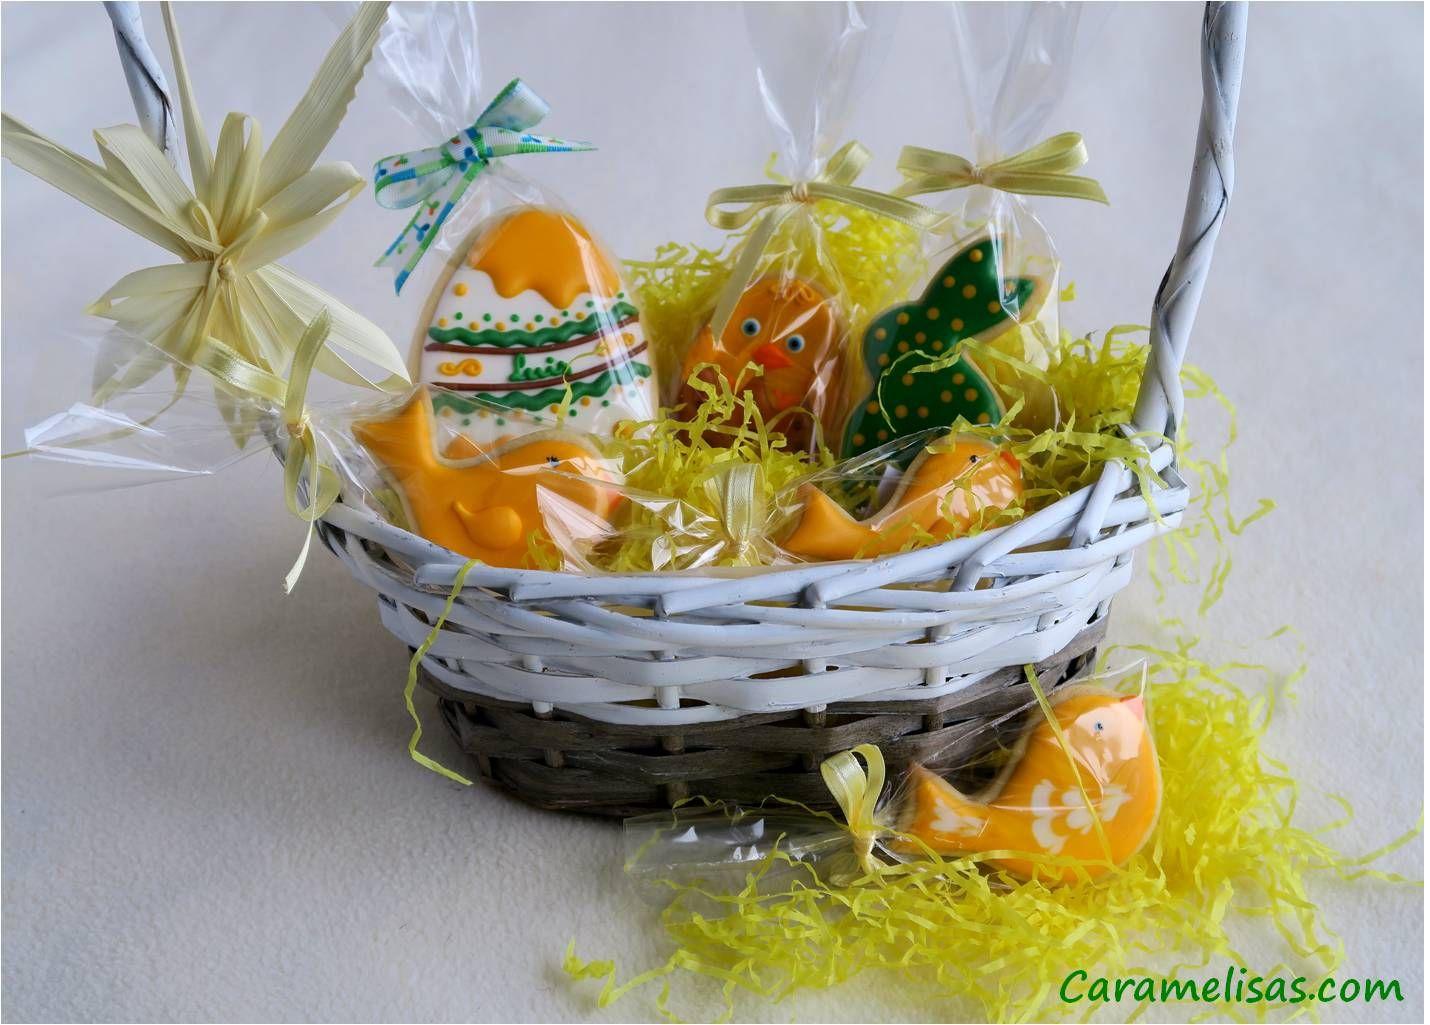 Para Luis #caramelisas #cookies #galletasdecoradas #sweet #followme #decoratedcookies #cookieart #royalicing #glasareal #easter #pascua #huevosdepascua #eastereggs #cestasdepascua